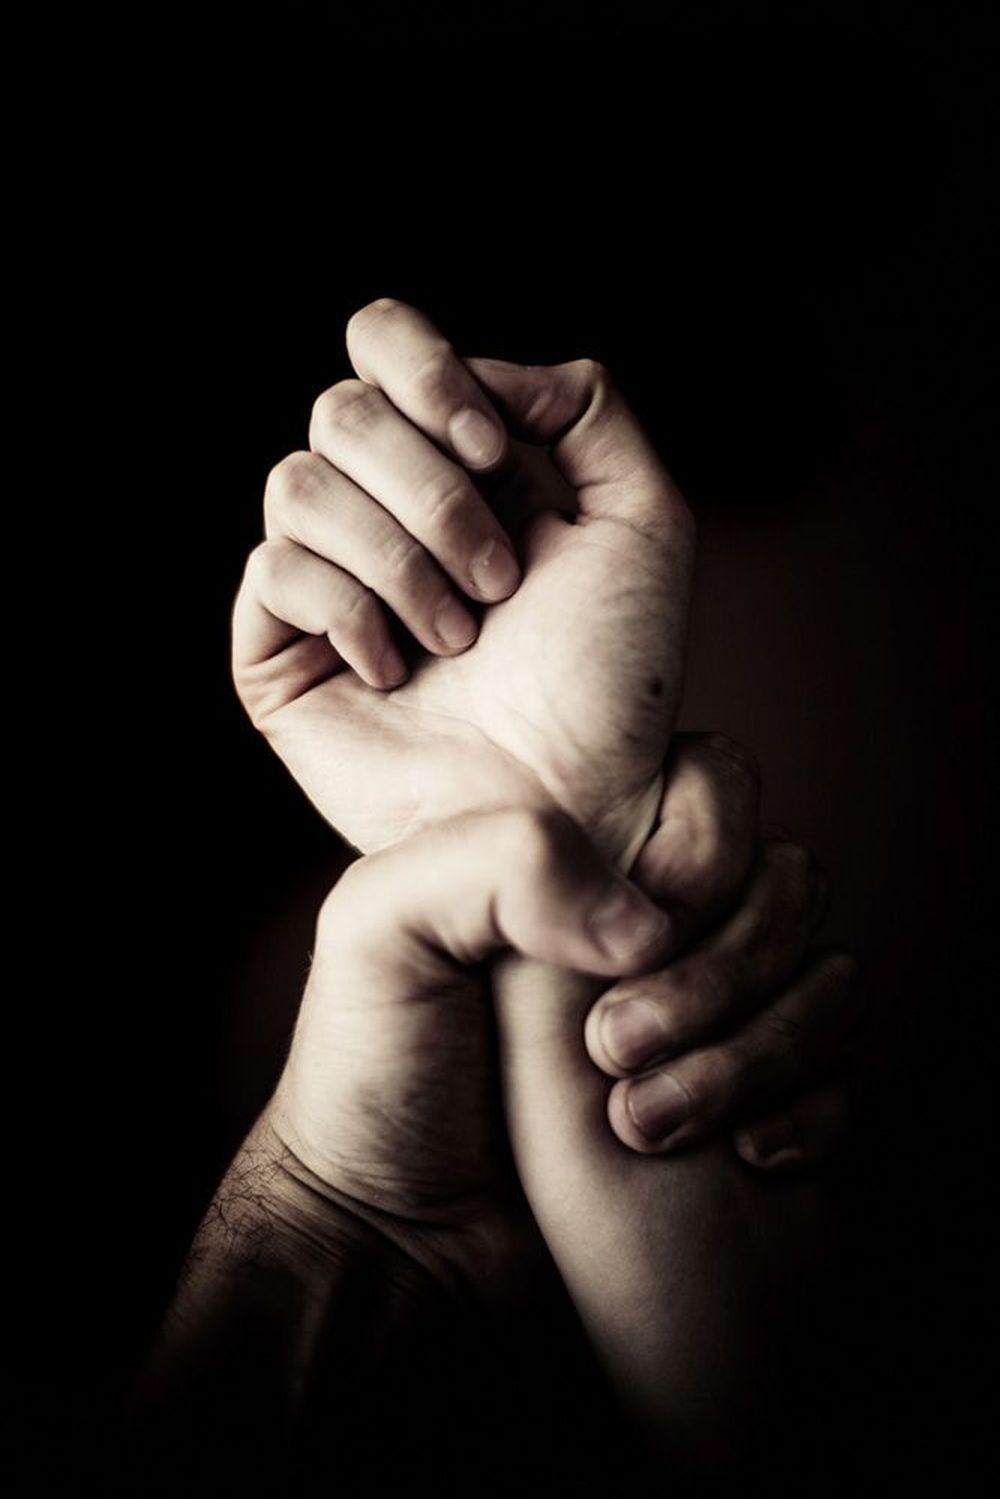 Hand closed around fist